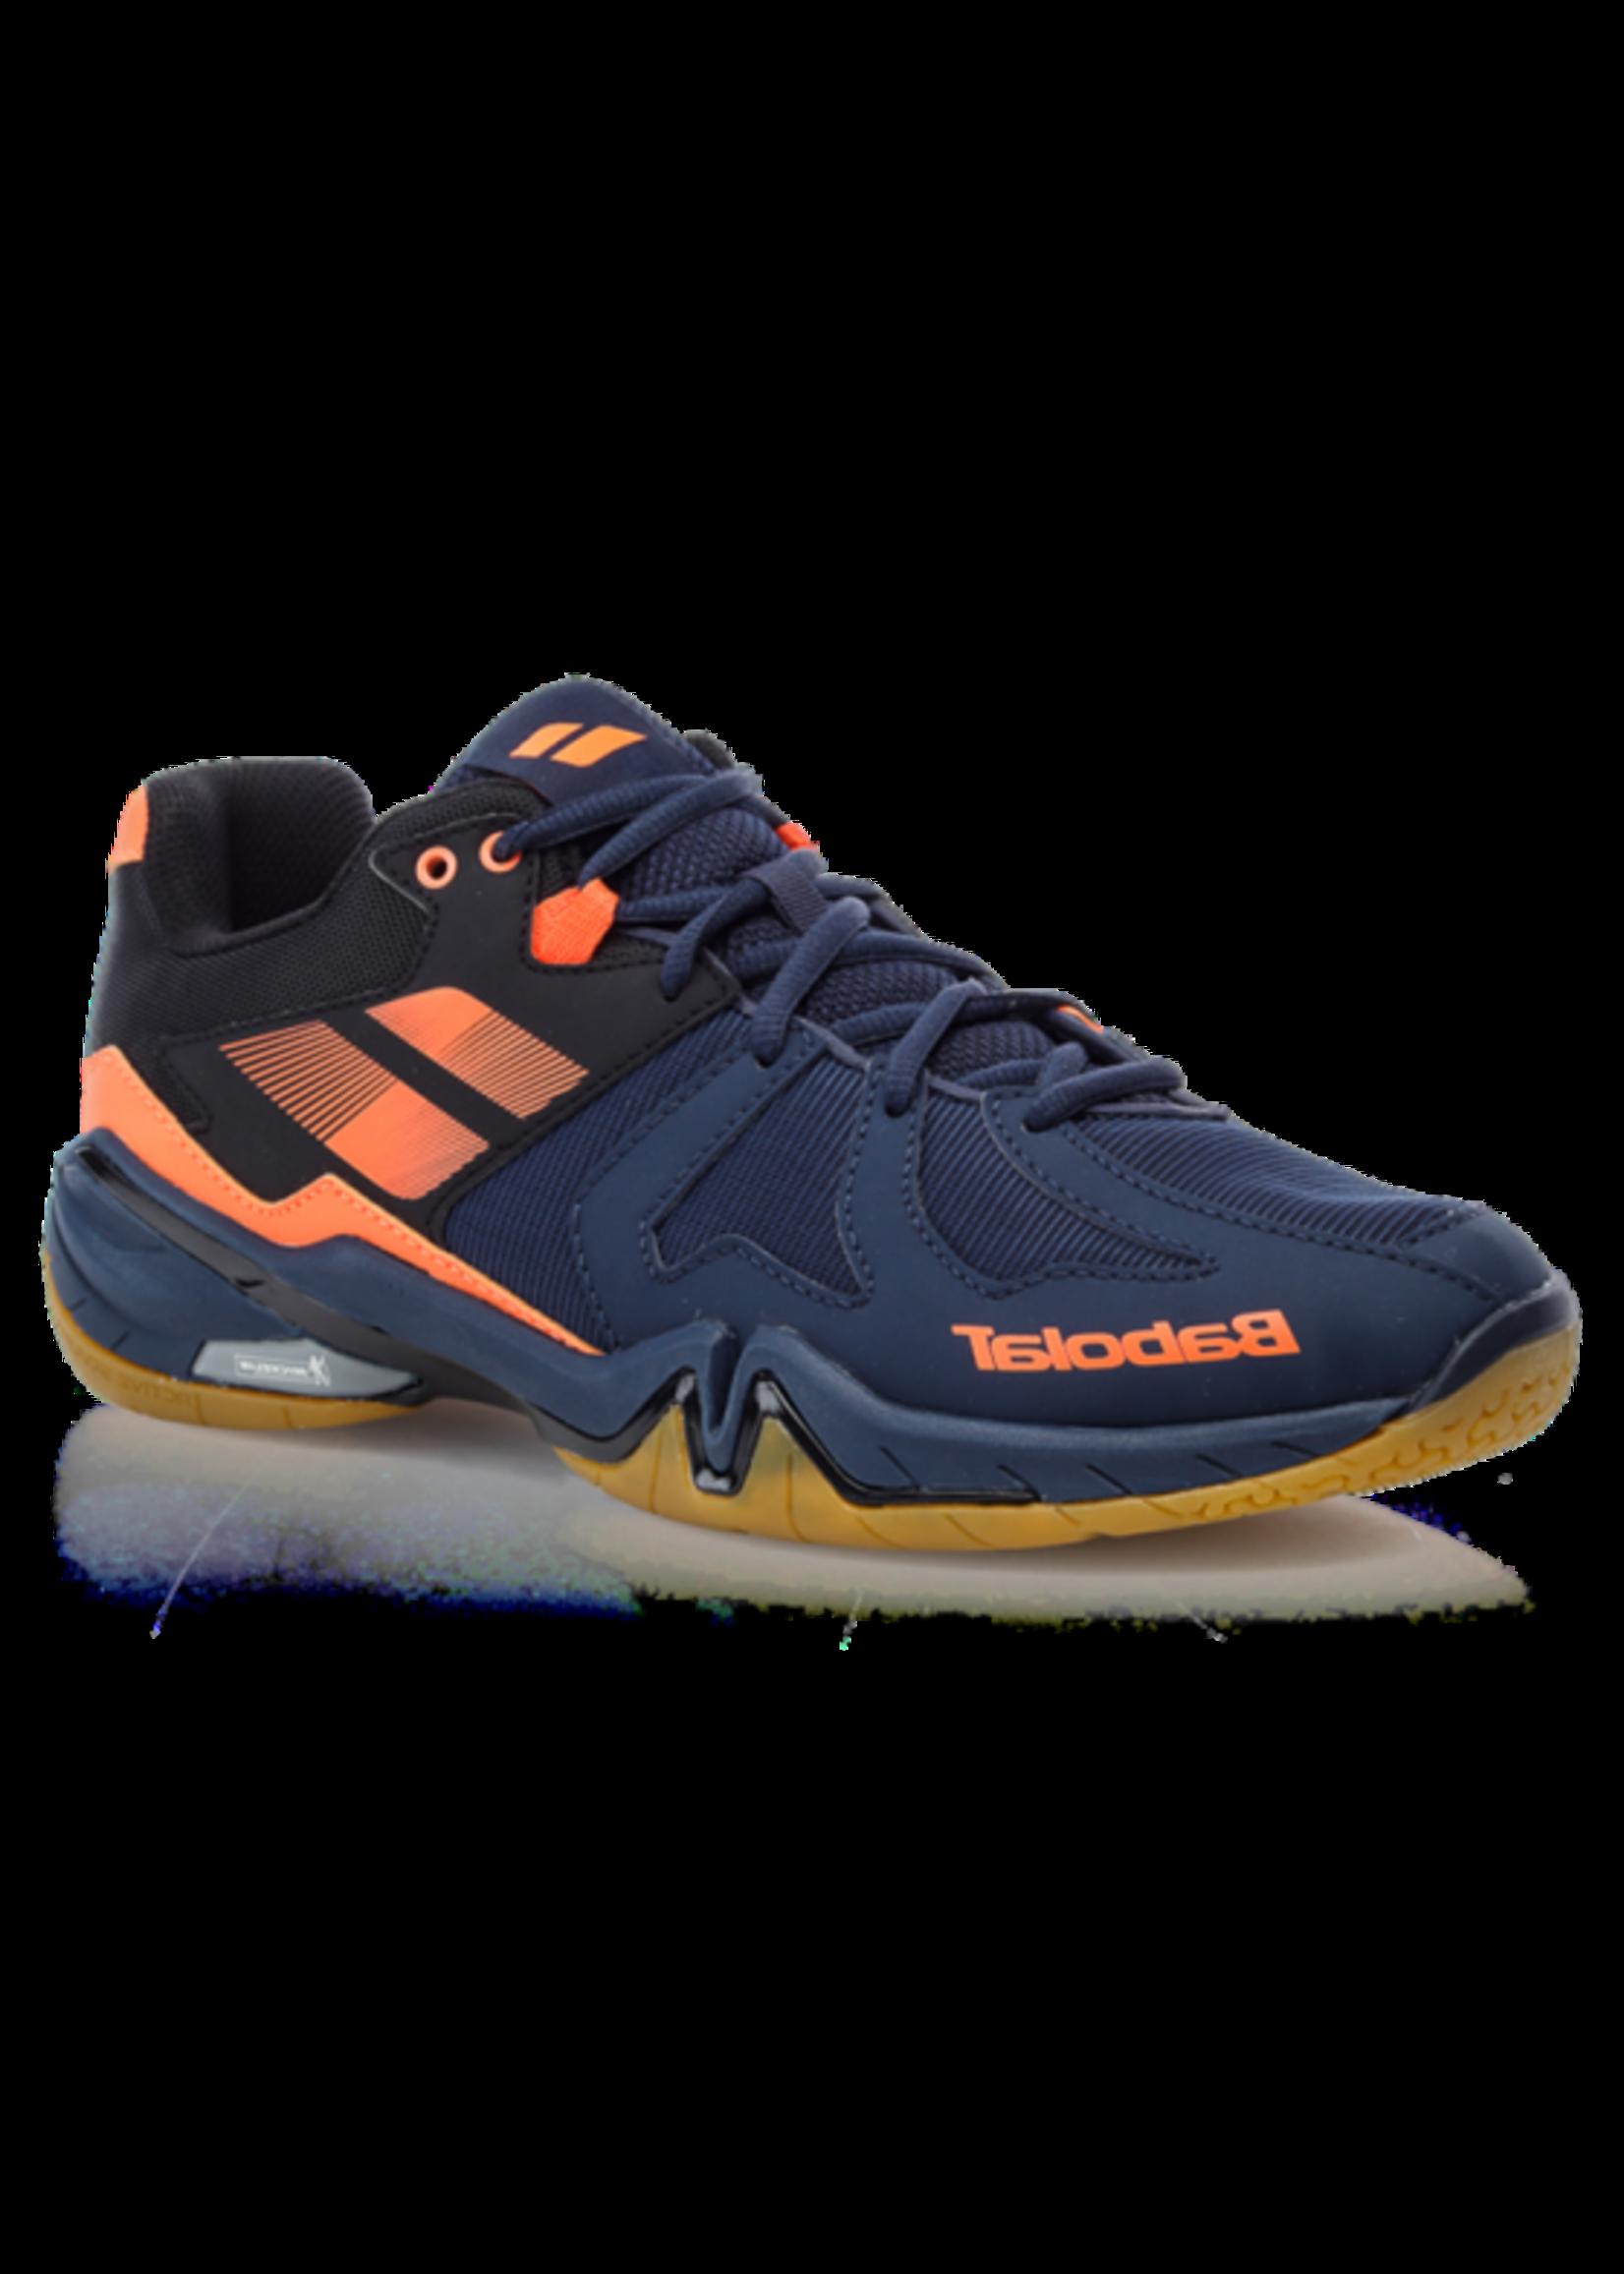 Babolat Babolat Shadow Spirit Mens Indoor Shoe (2018) Navy Blue/Fluo Orange 7.5